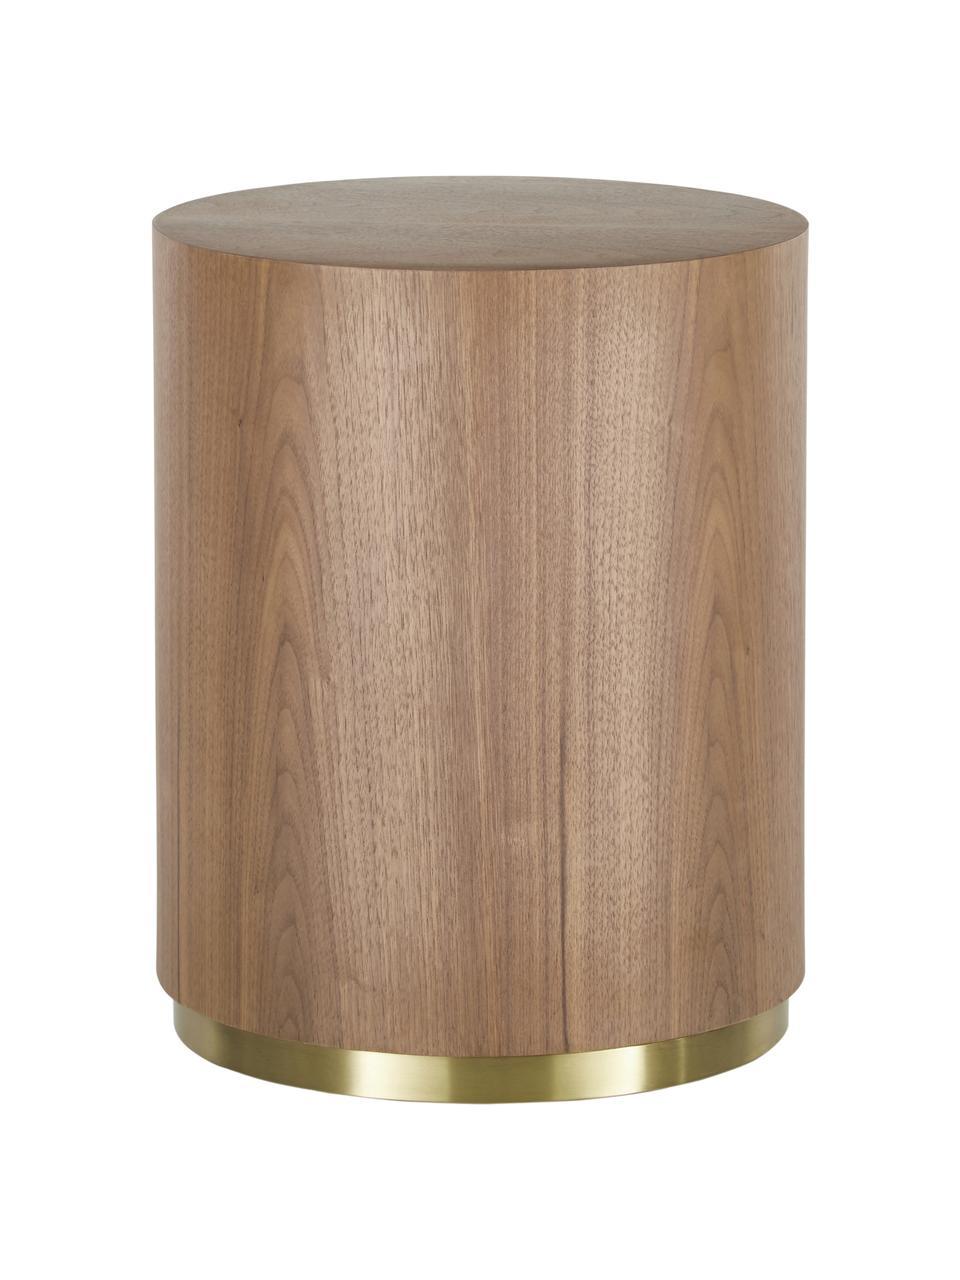 Tavolino rotondo color noce Clarice, Finitura in noce, Ø 40 x Alt. 50 cm